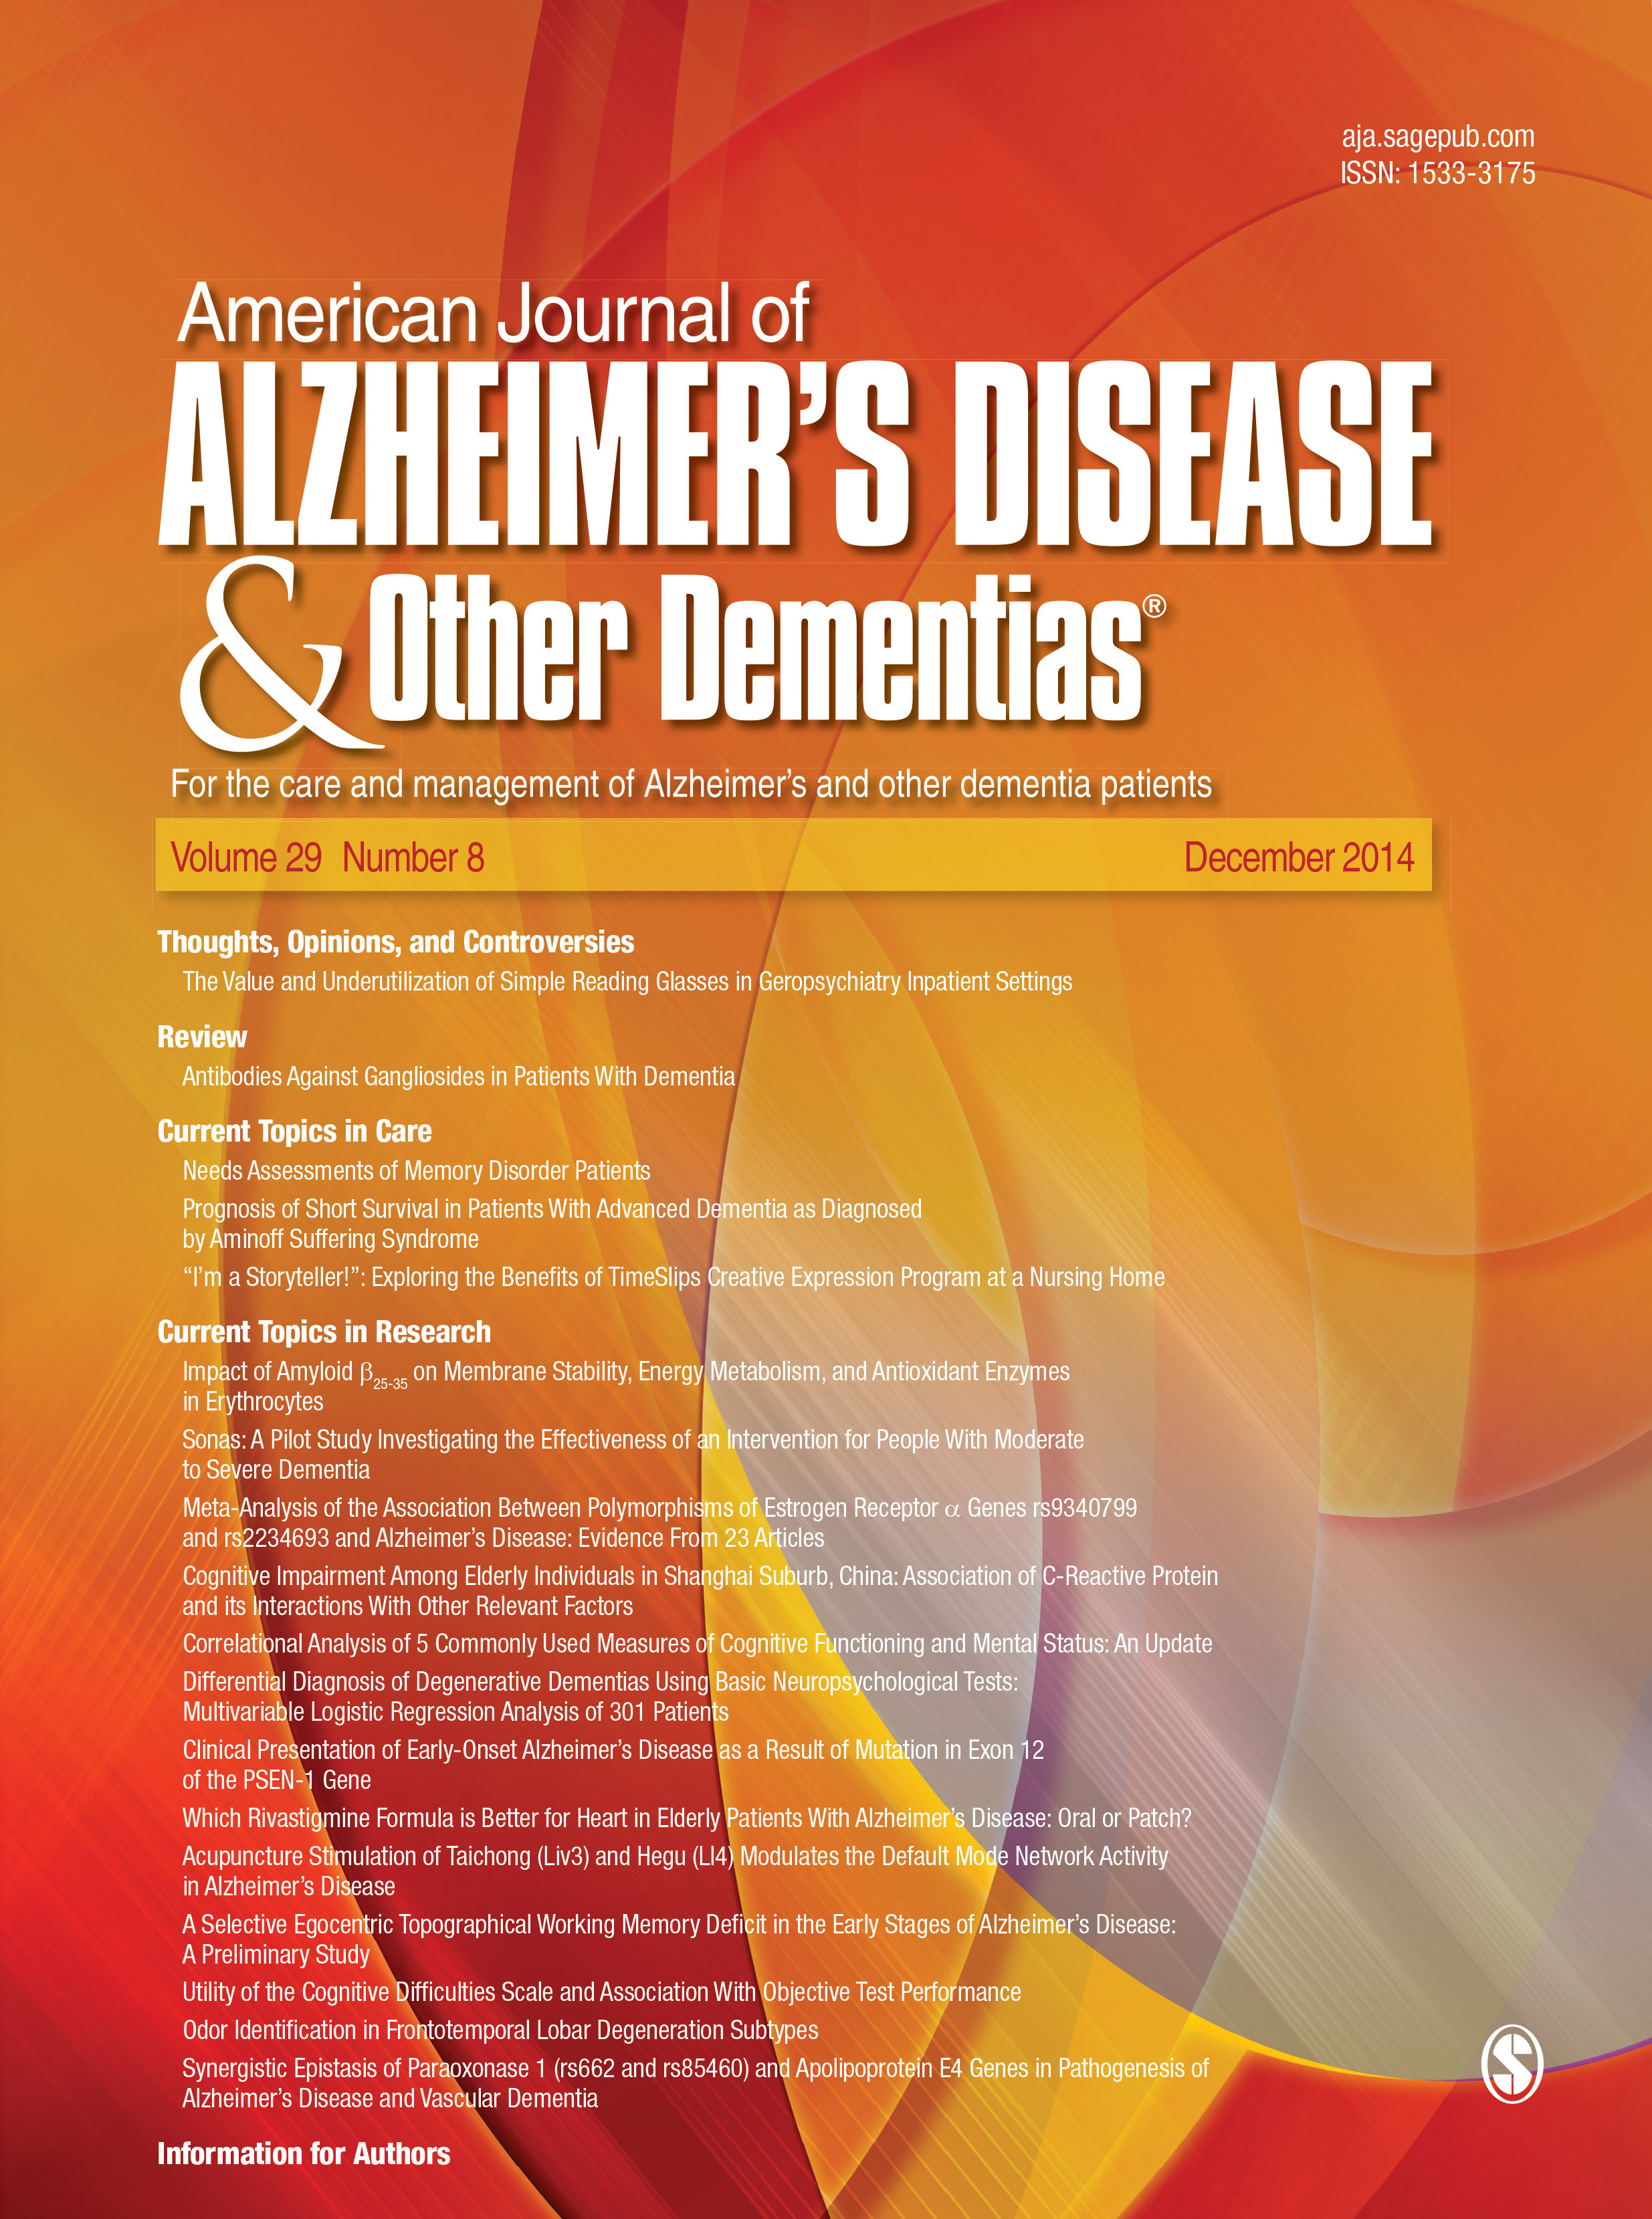 American Journal of Alzheimer's Disease & Other Dementias